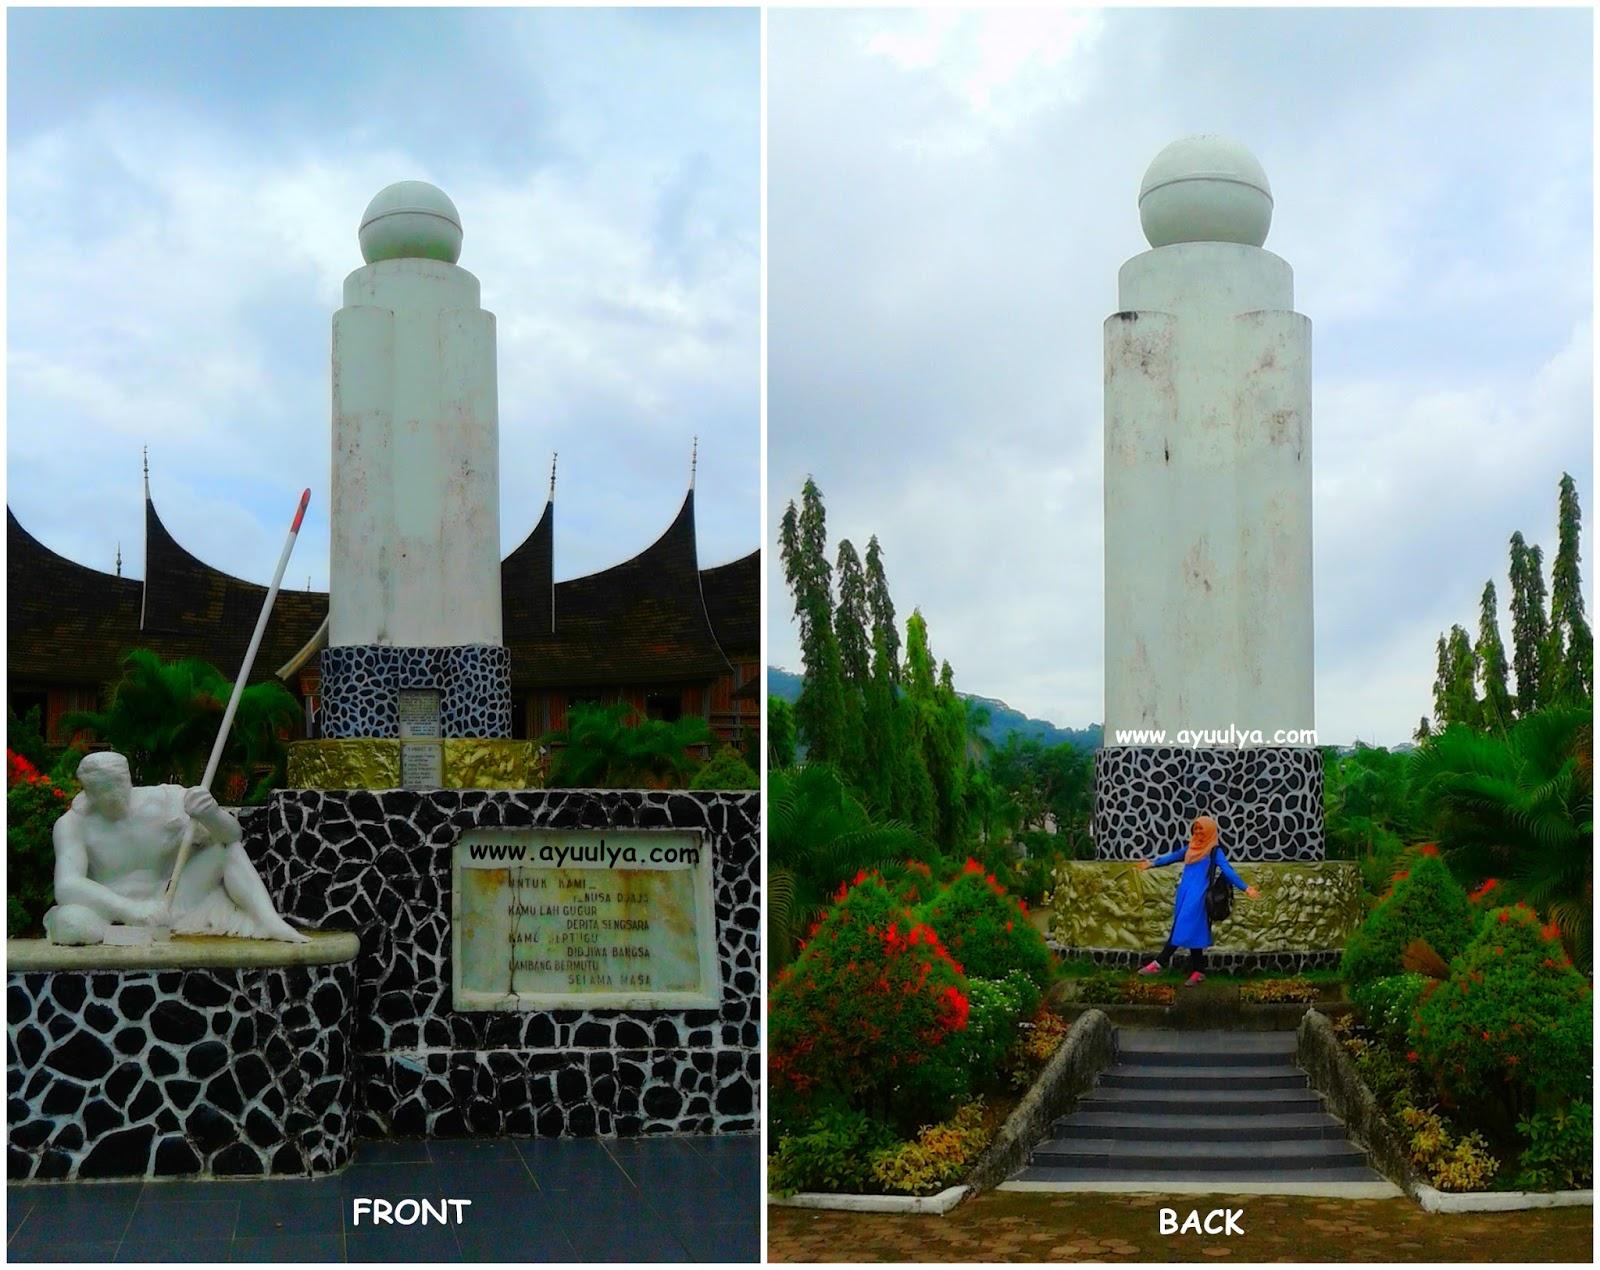 5 Keunikan Museum Adityawarman Kota Padang Blog Ayu Ulya Sumatera